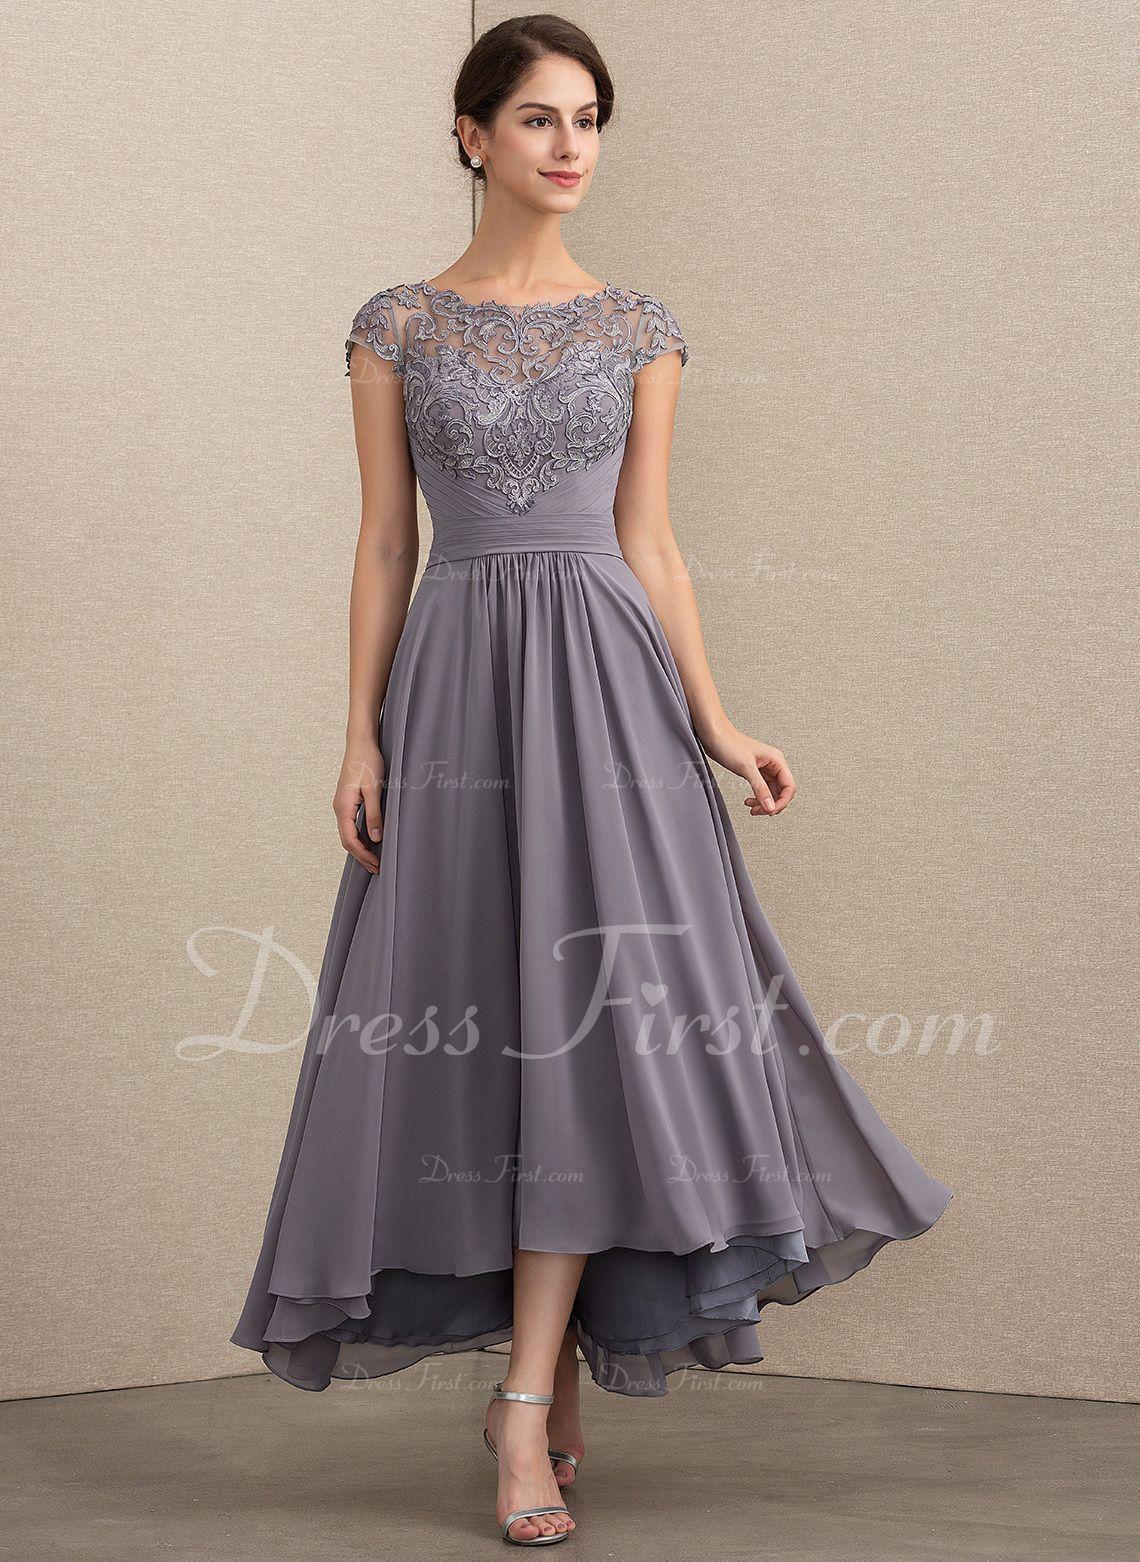 A Line Scoop Neck Asymmetrical Chiffon Lace Evening Dress